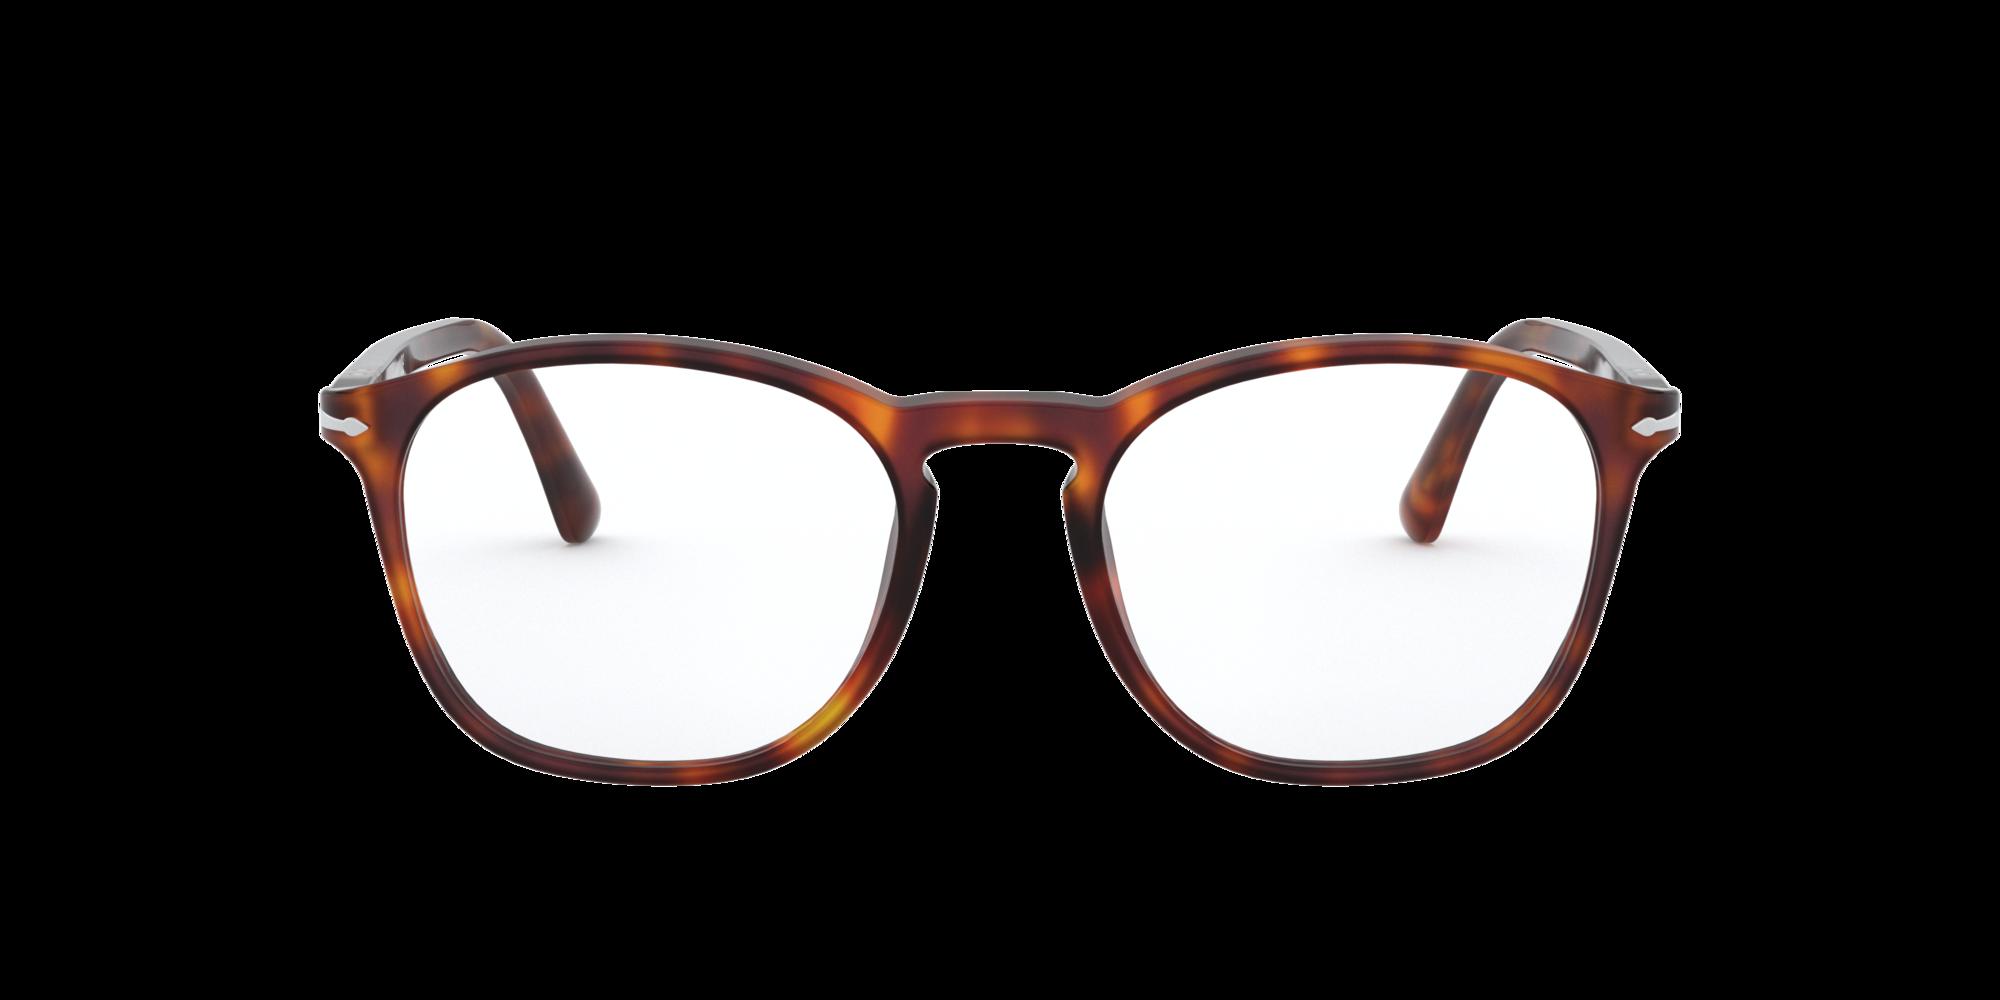 Image for PO3007VM from LensCrafters | Glasses, Prescription Glasses Online, Eyewear